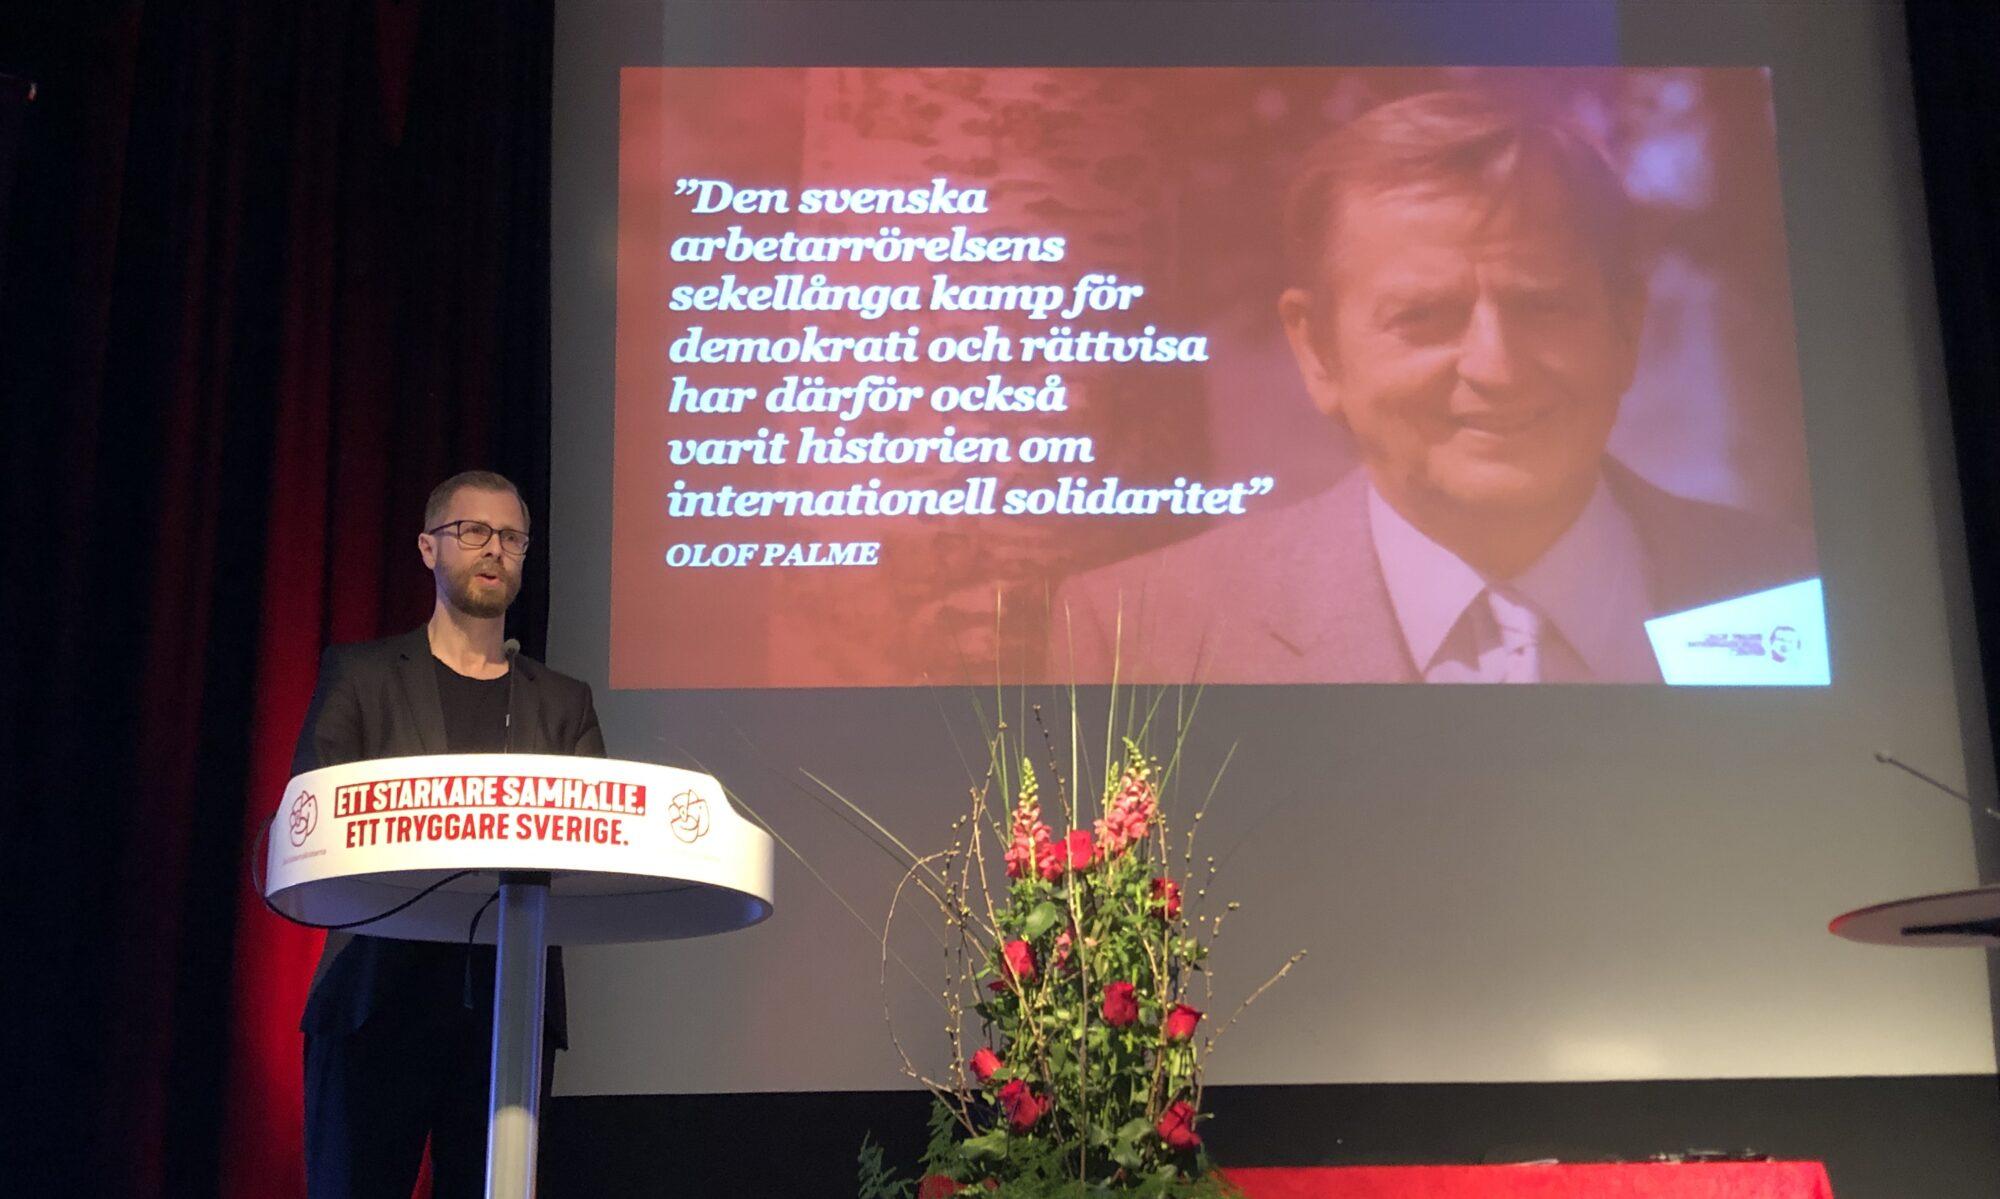 Markus Alexandersson